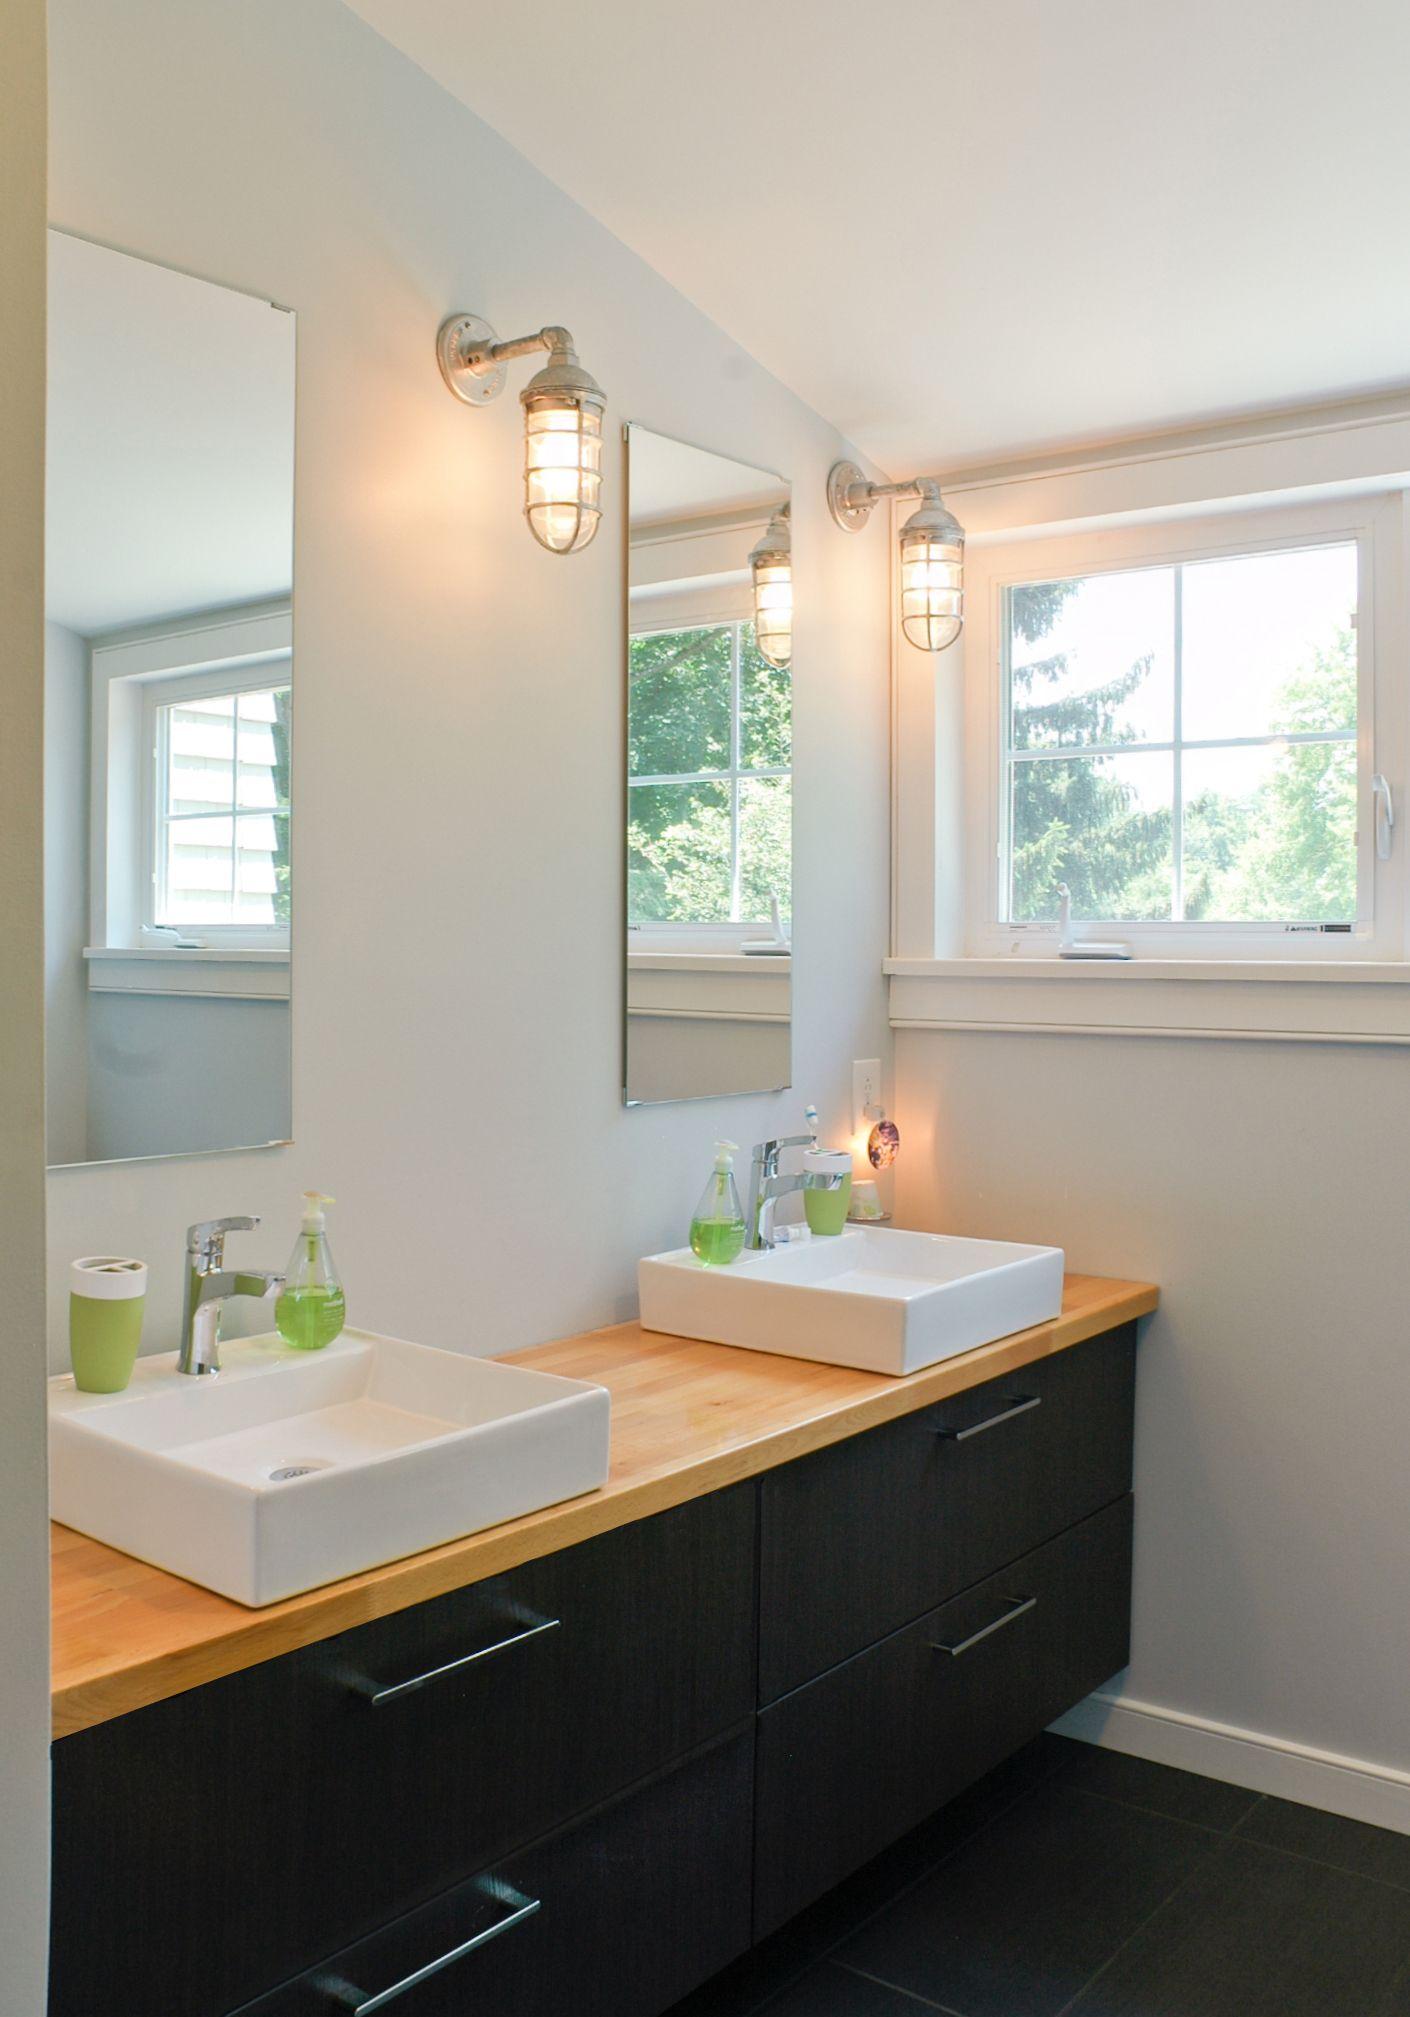 ikea dresser bathroom vanity. Black Bedroom Furniture Sets. Home Design Ideas